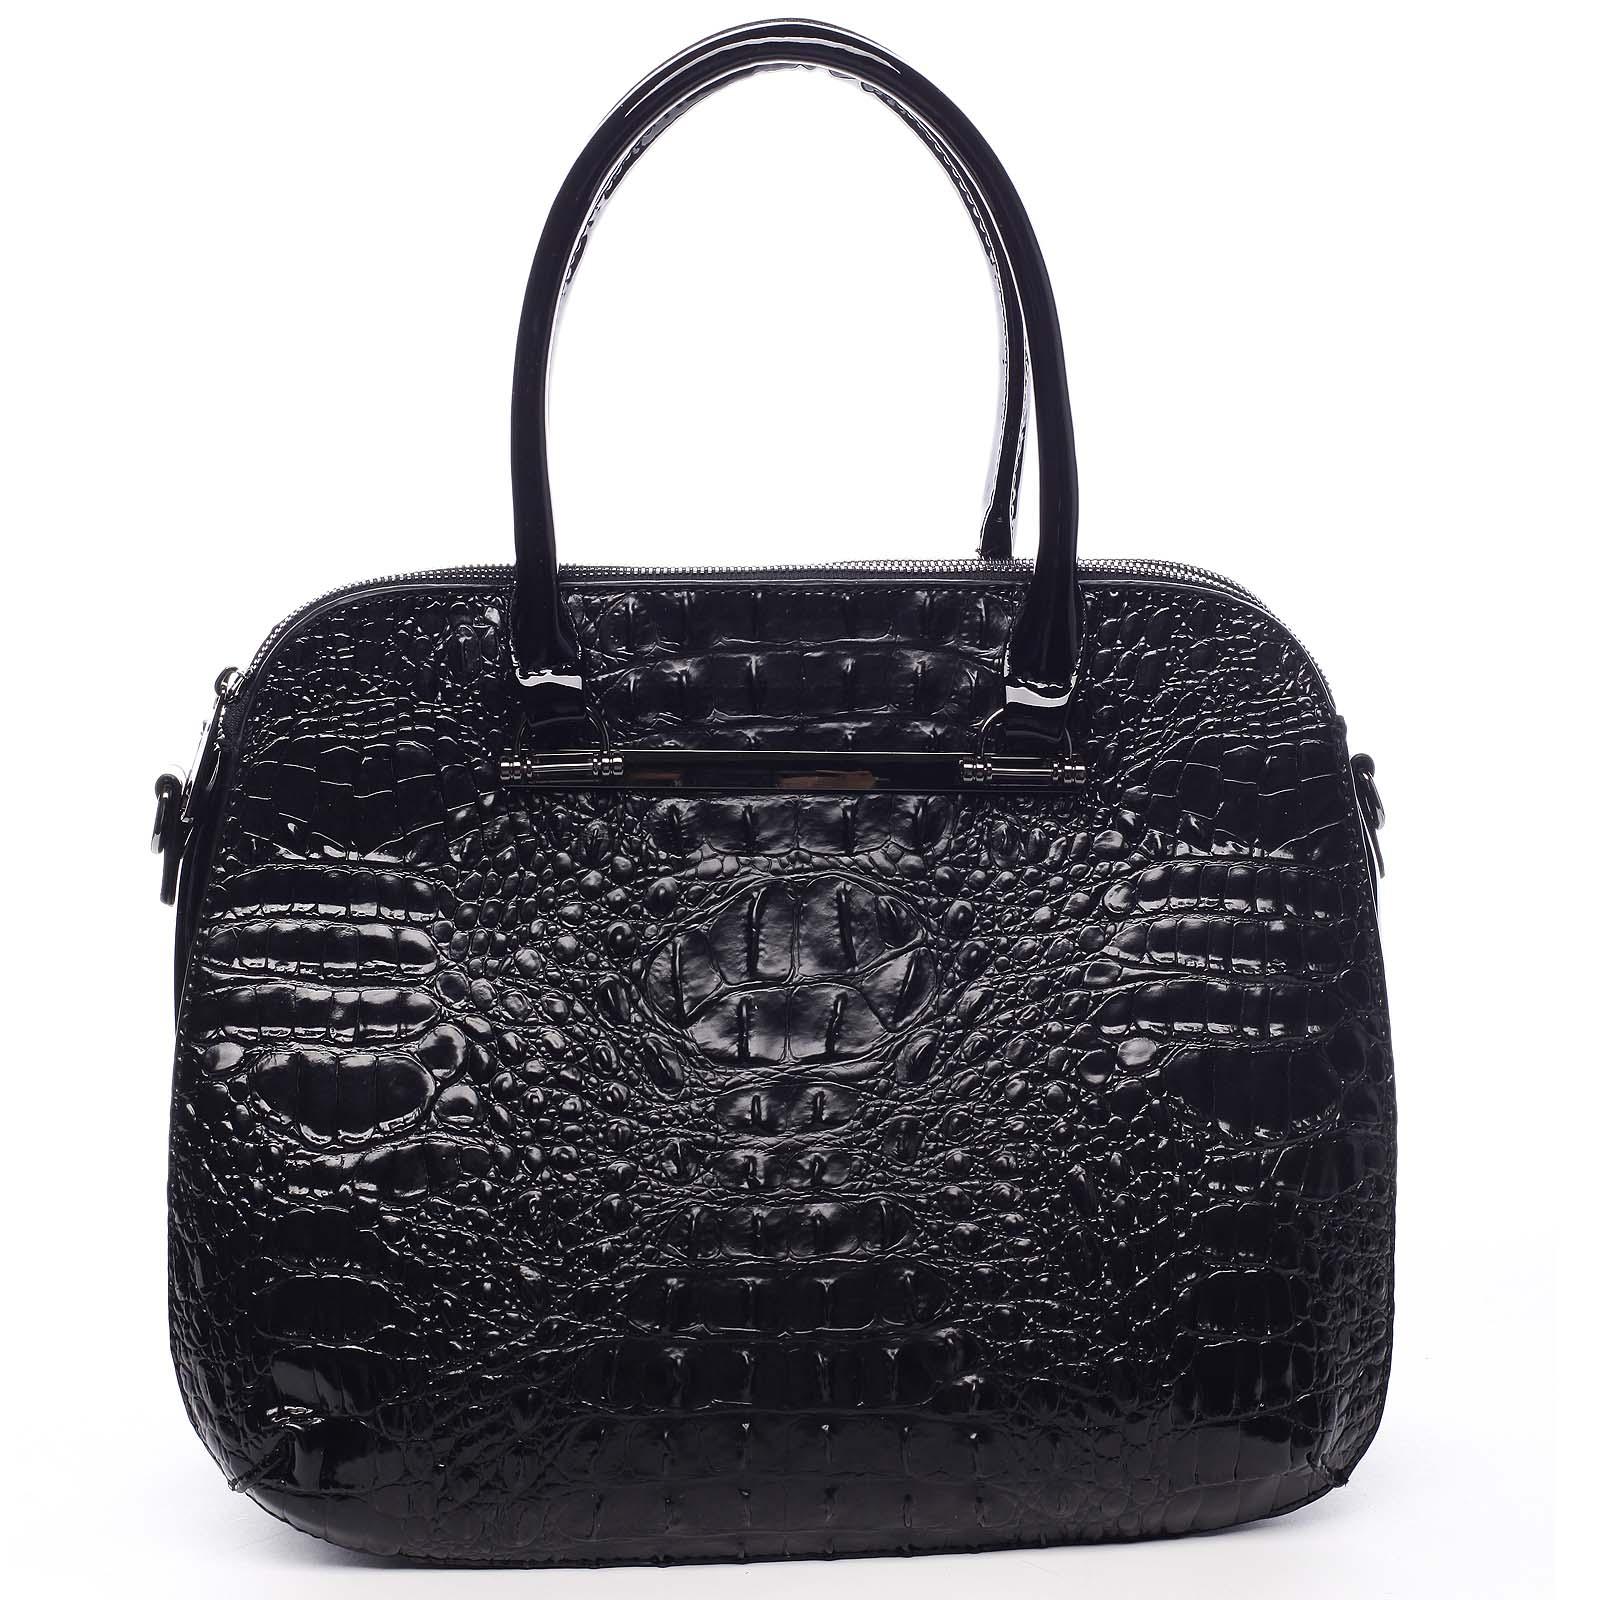 Dámská kabelka do ruky černá - Dudlin Lexi černá